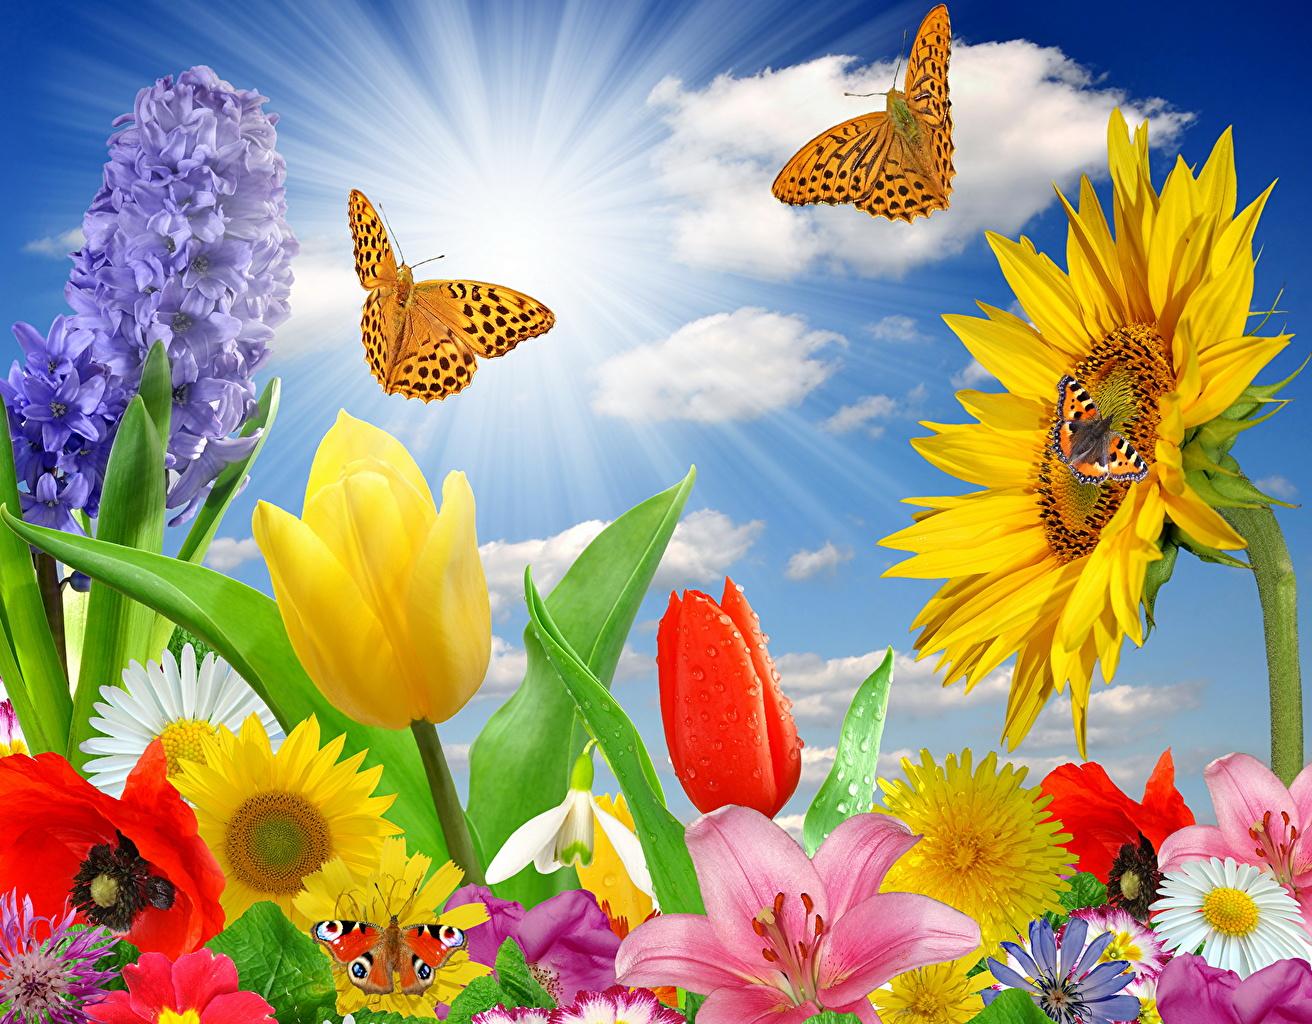 Desktop Wallpapers Rays of light Butterflies Tulips flower